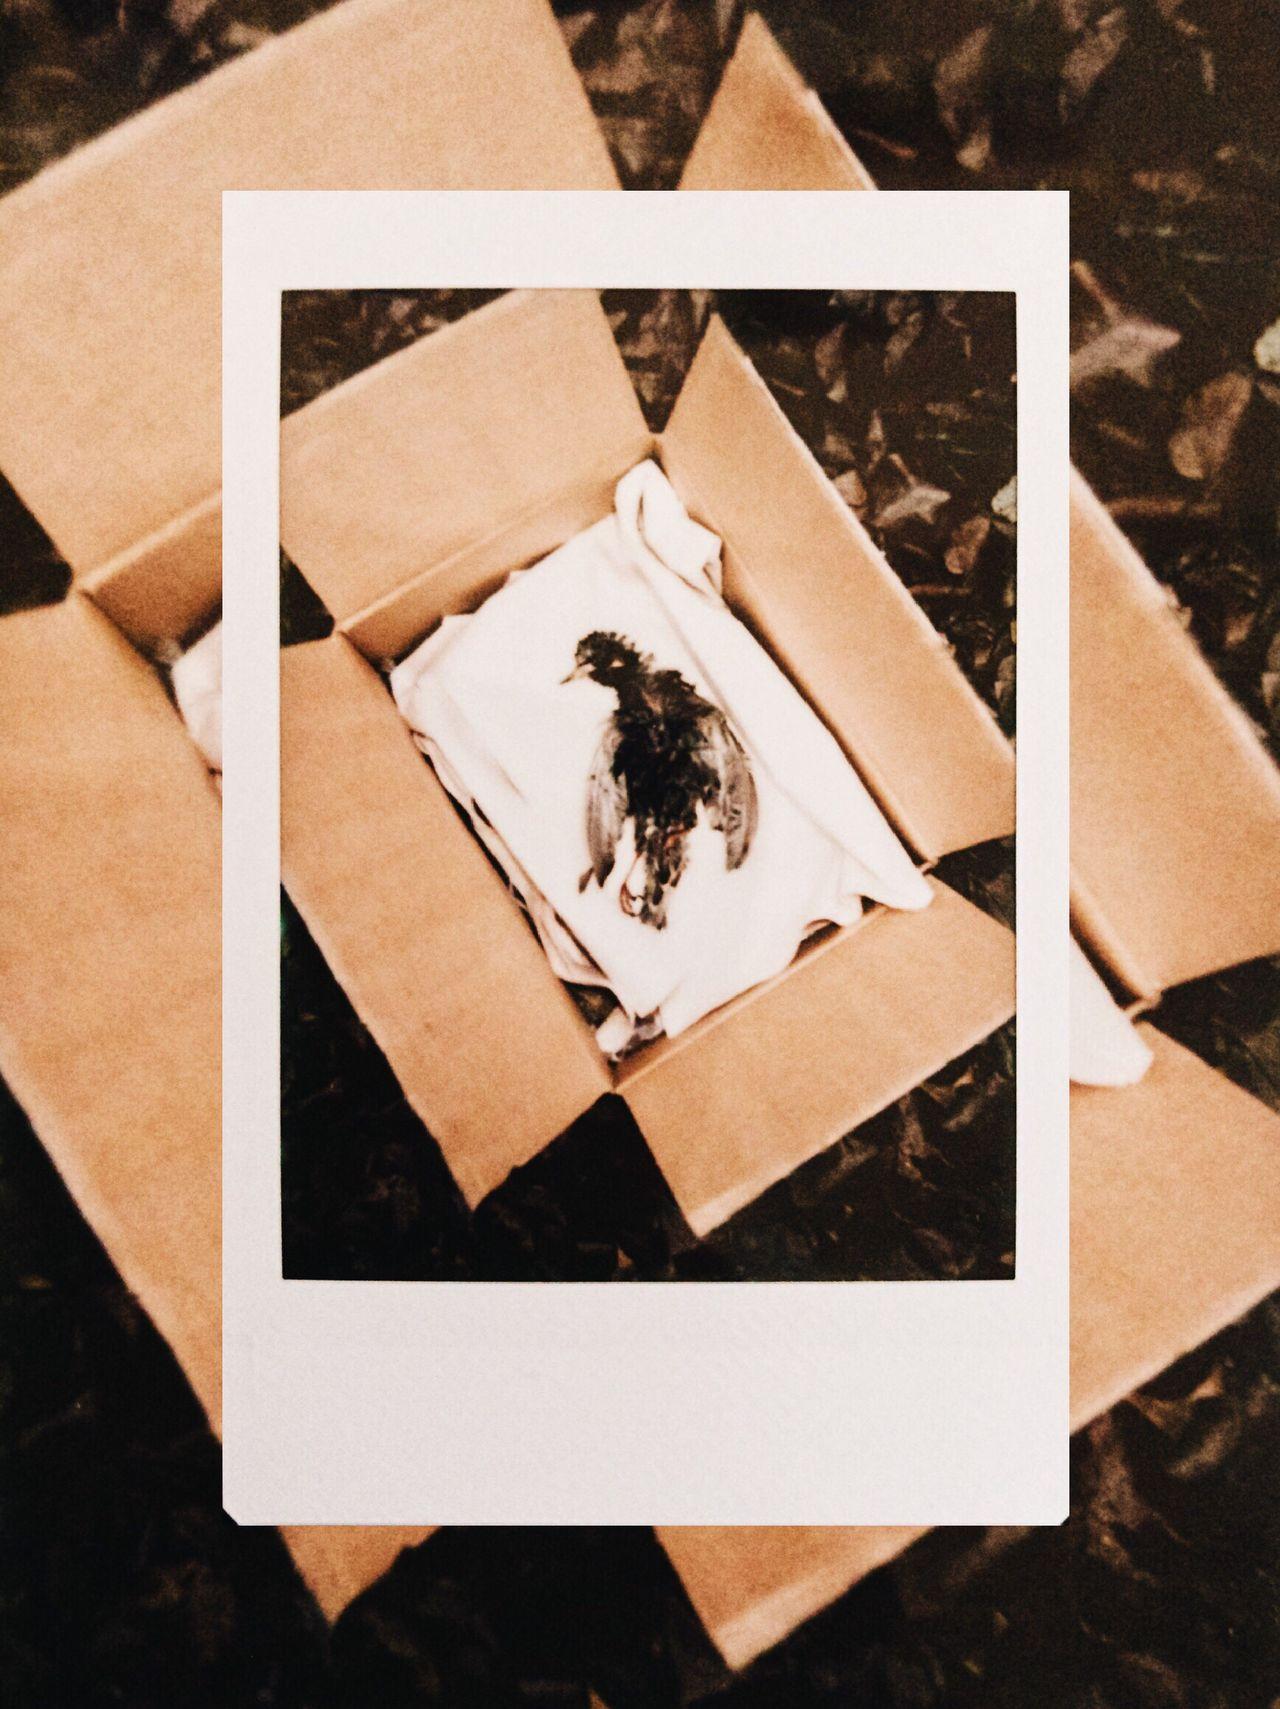 Directly above shot of bird in cardboard box